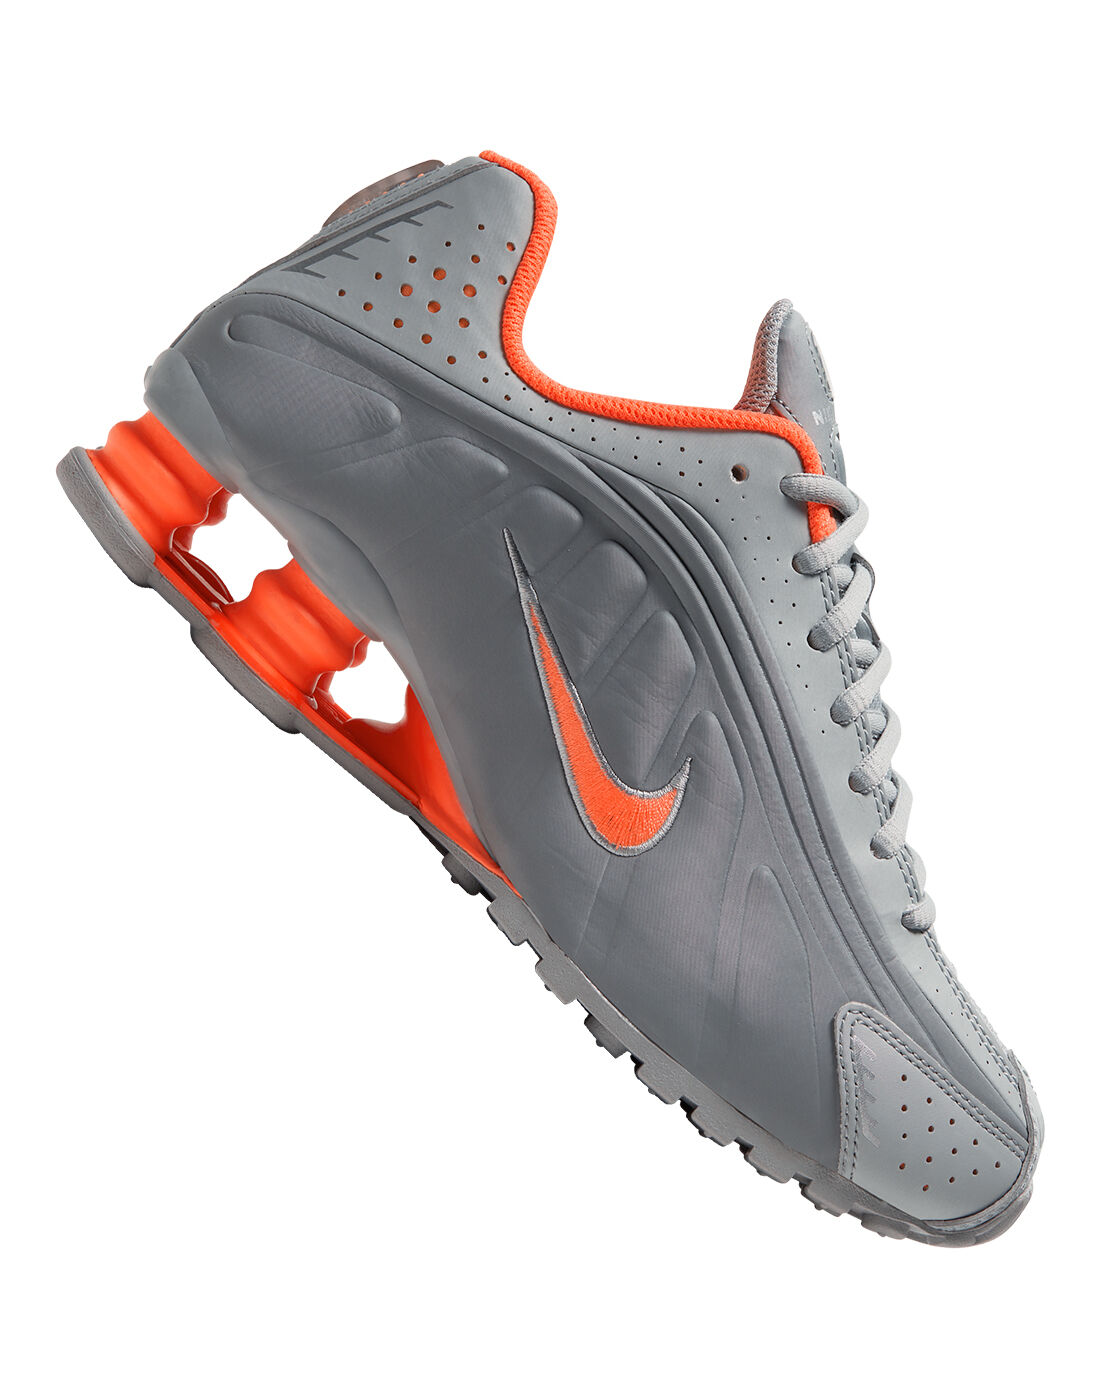 Nike Older Boys Shox | Life Style Sports